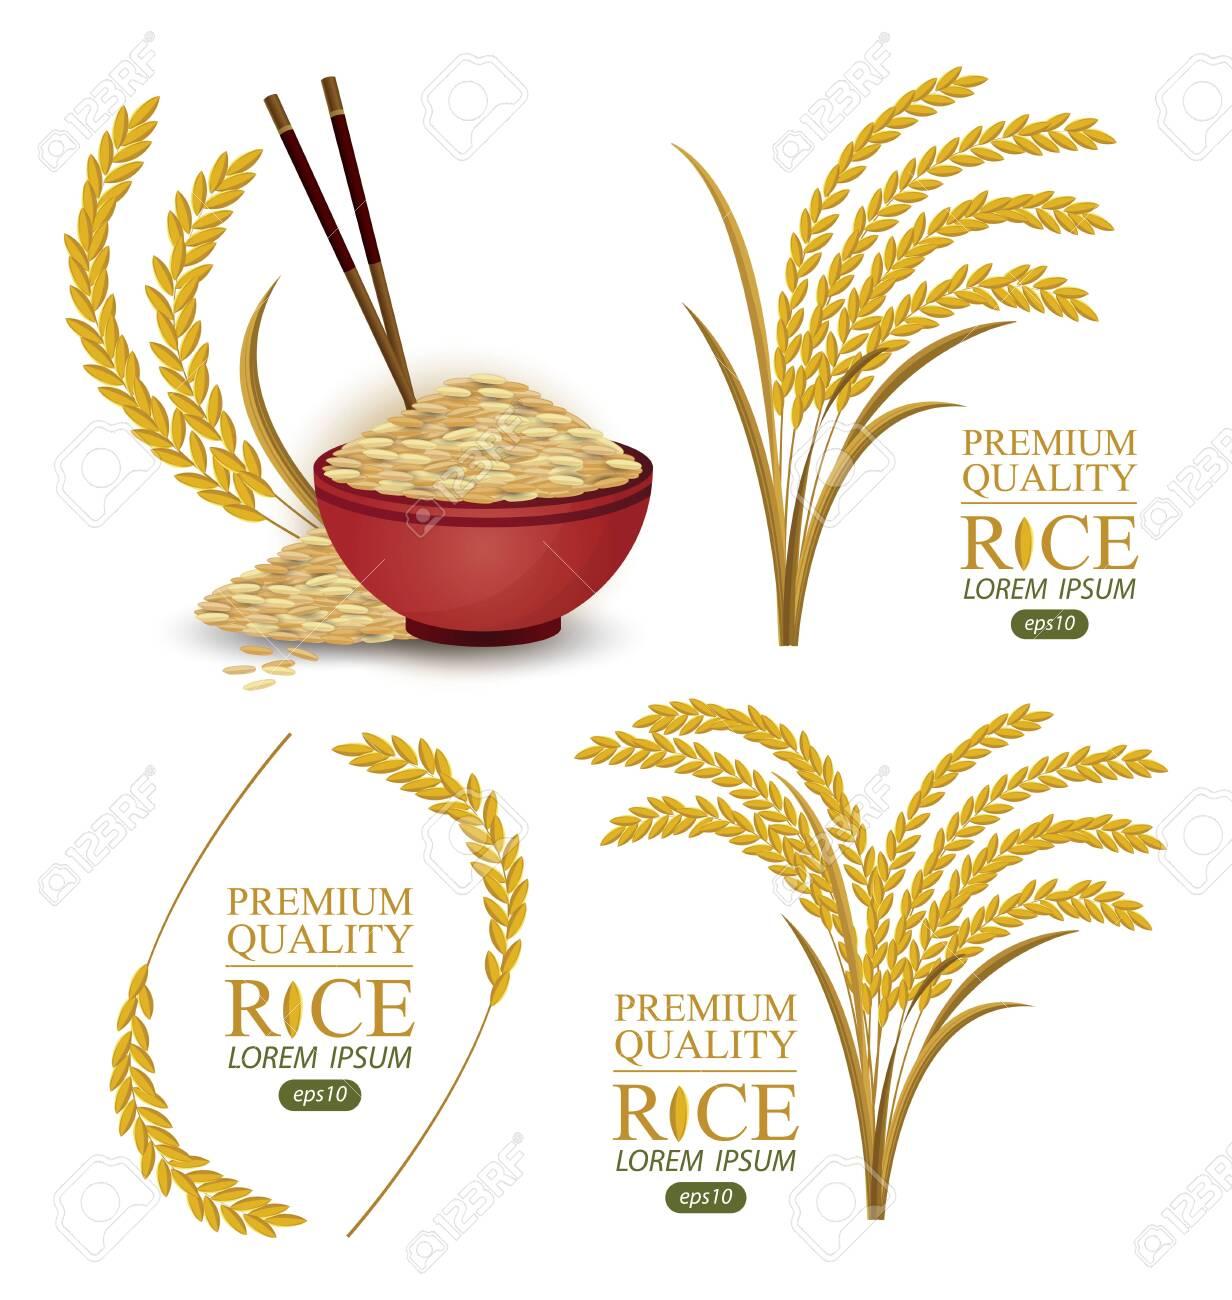 Rice. Vector illustration. - 137138937